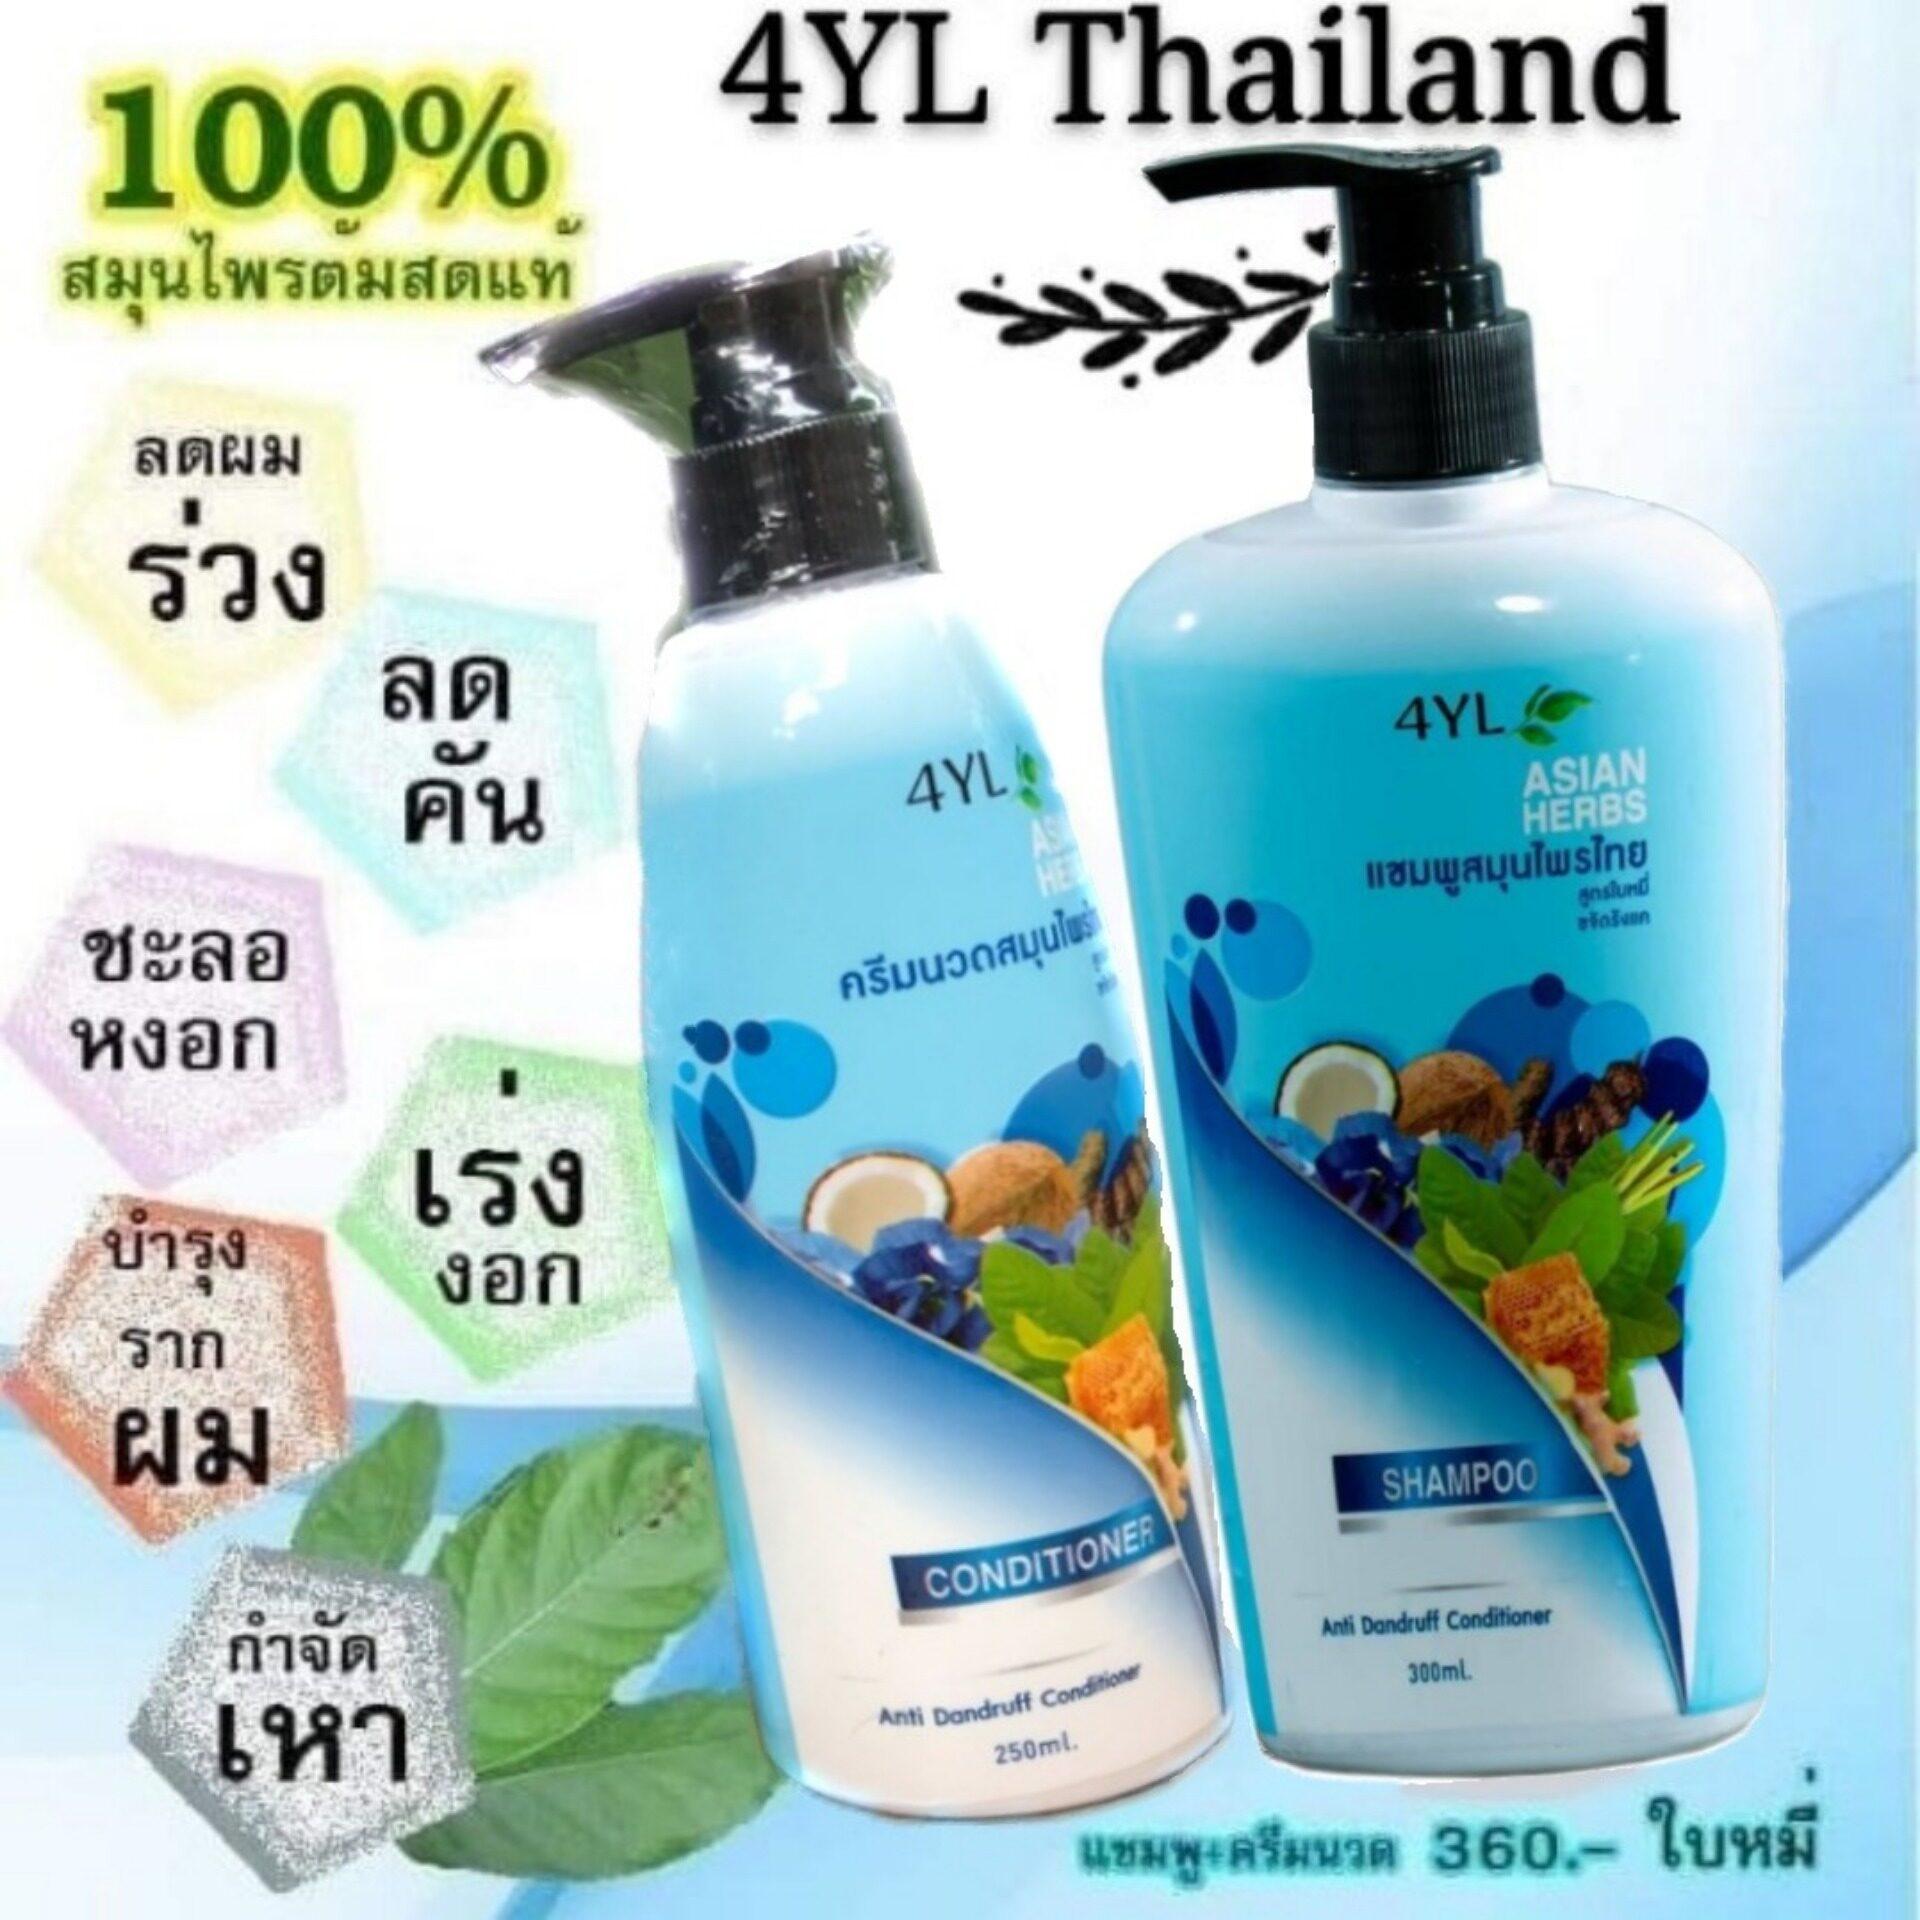 ☘️แชมพูสมุนไพรต้มสดสูตรใบหมี่ 4YL Thailand สูตรขจัดรังแค แก้เชื้อราบนหนังศีรษะ (แชมพู+ครีมนวด)